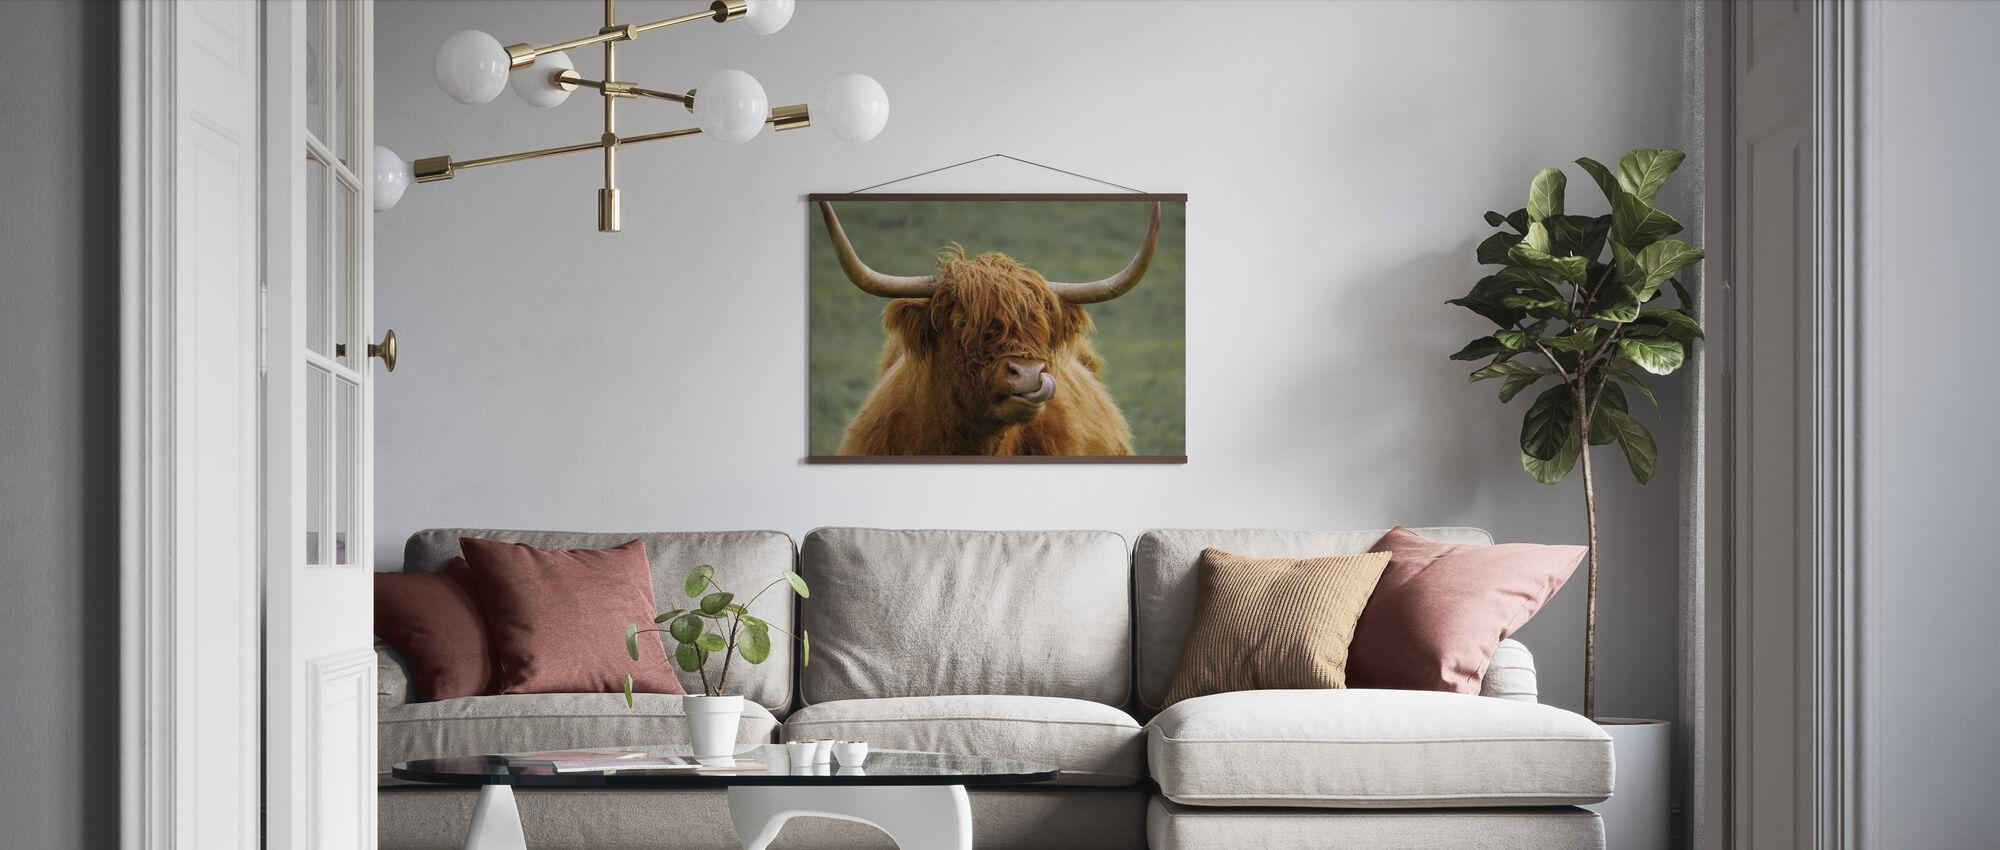 Highland Cattle - Poster - Living Room